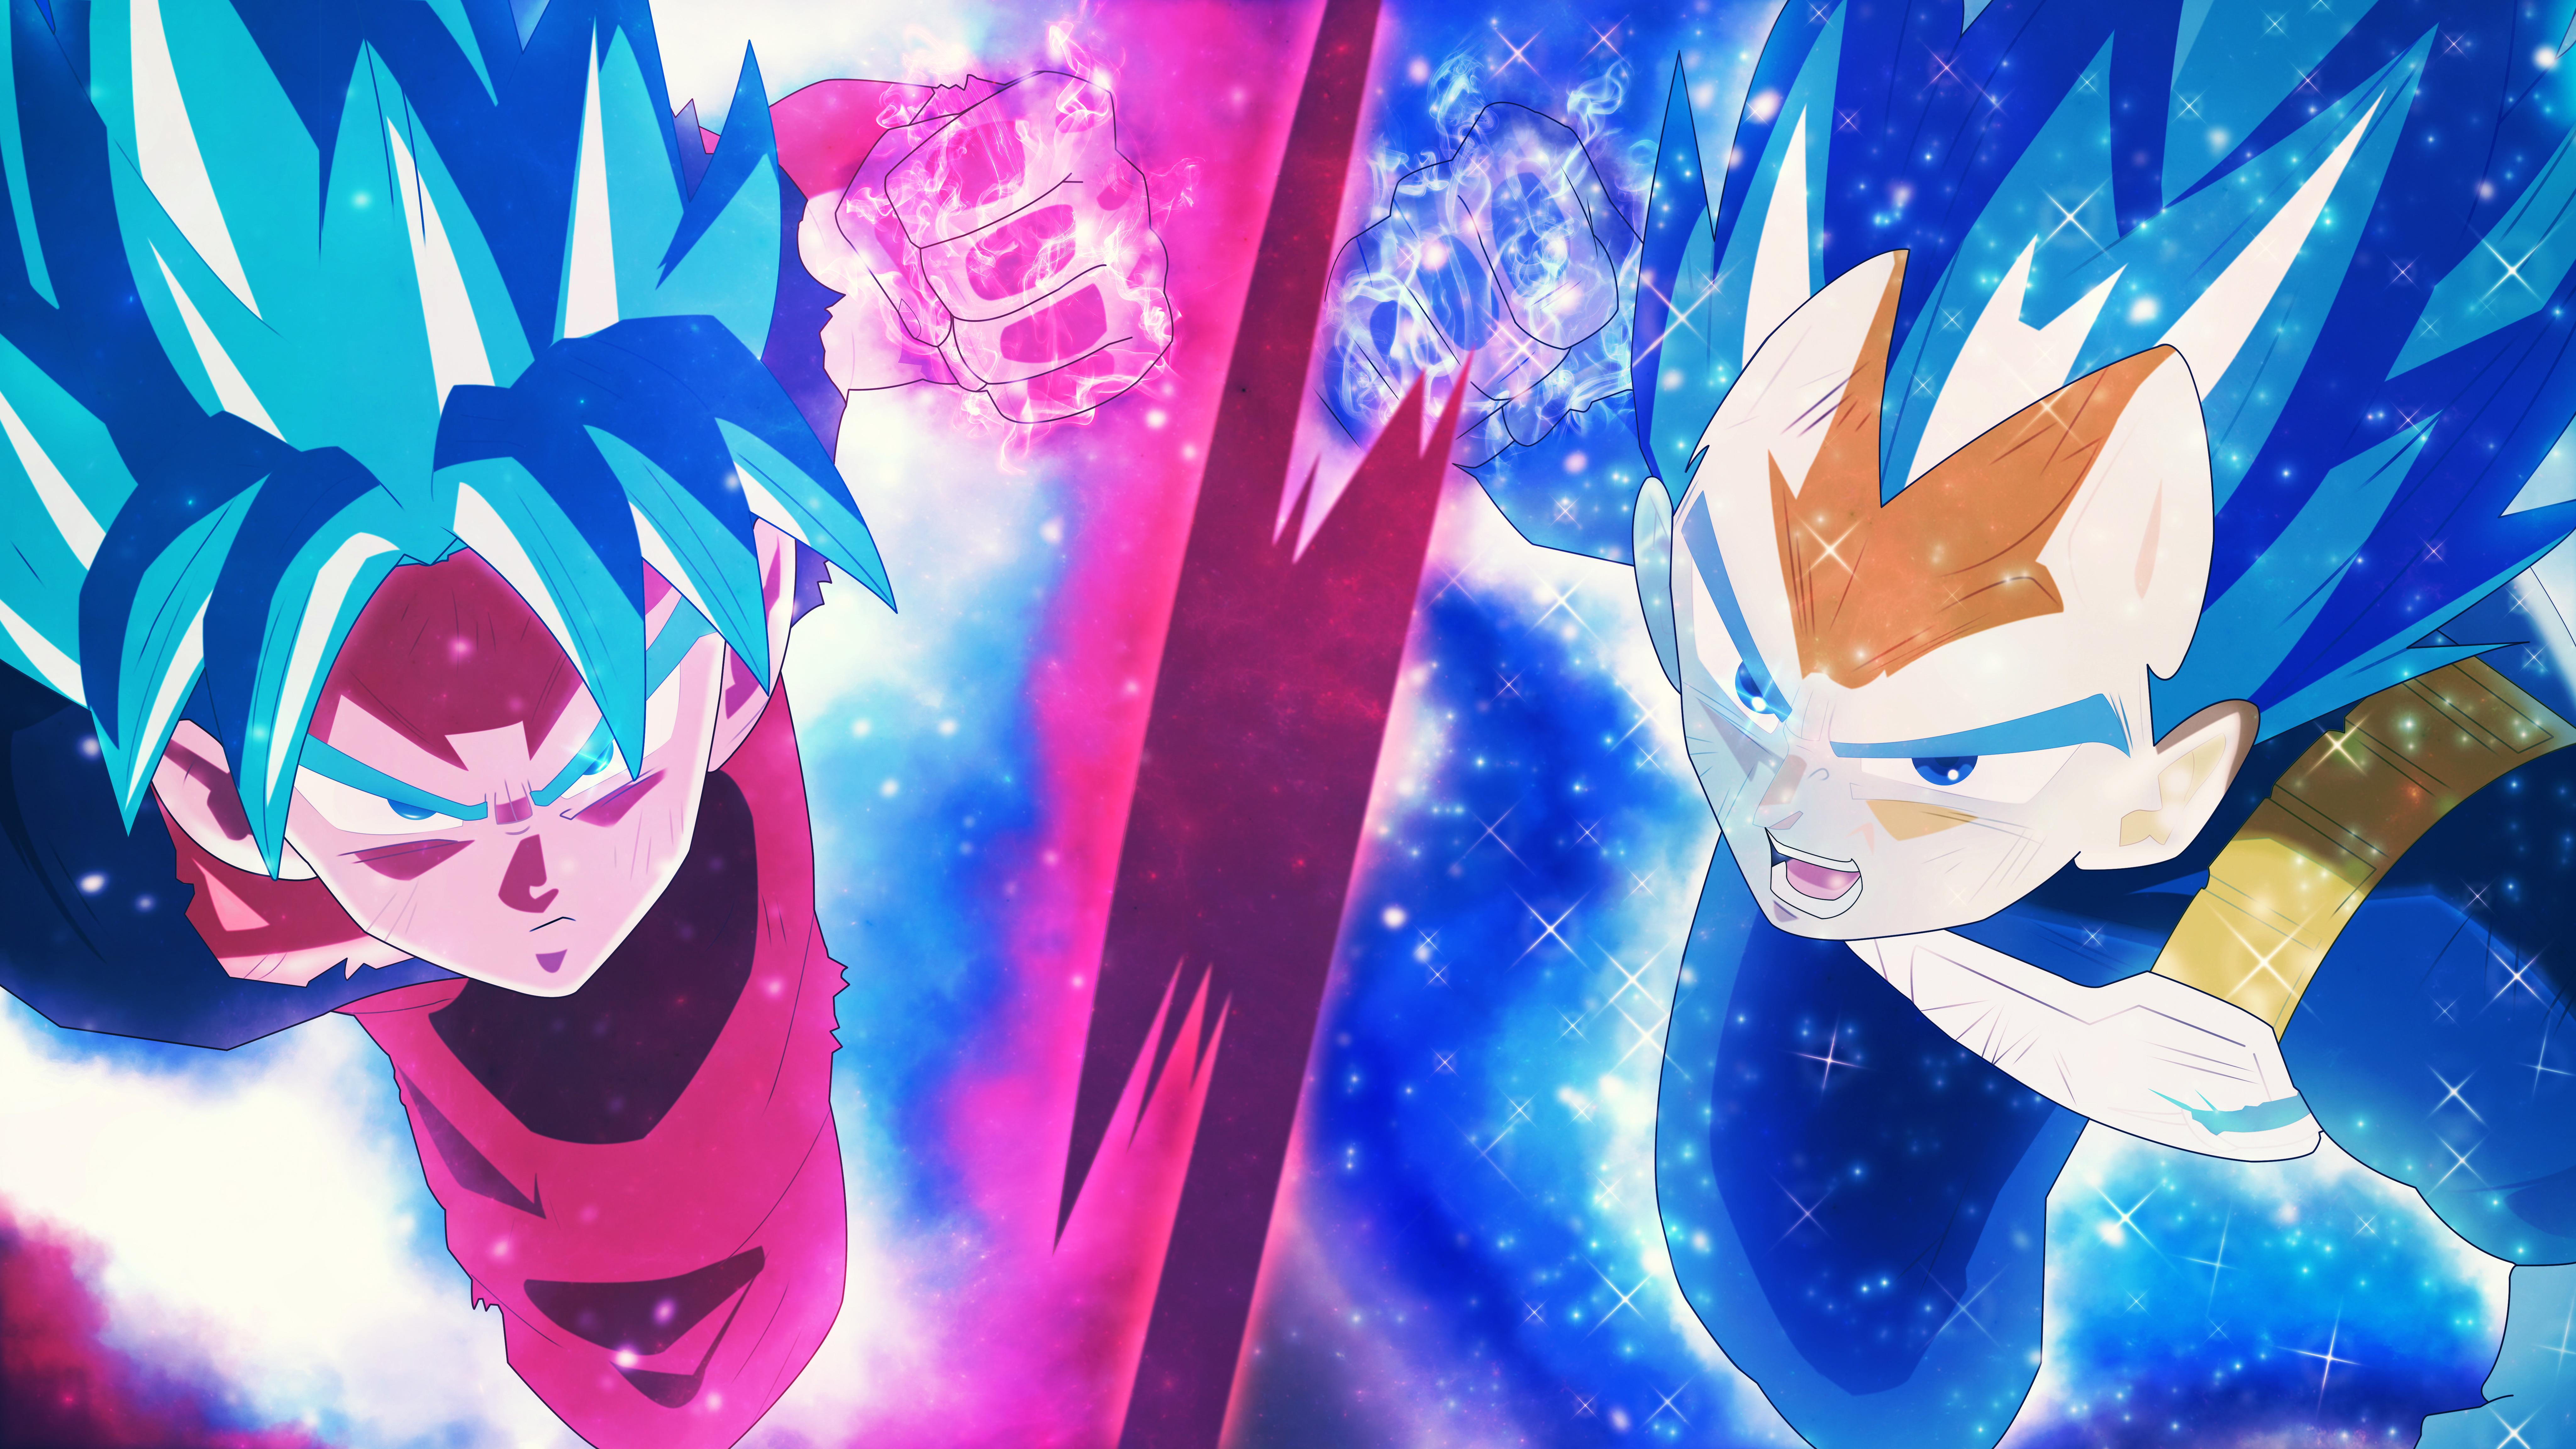 3840x2160 Dragon Ball Super Super Saiyan Blue 8k 4k HD 4k